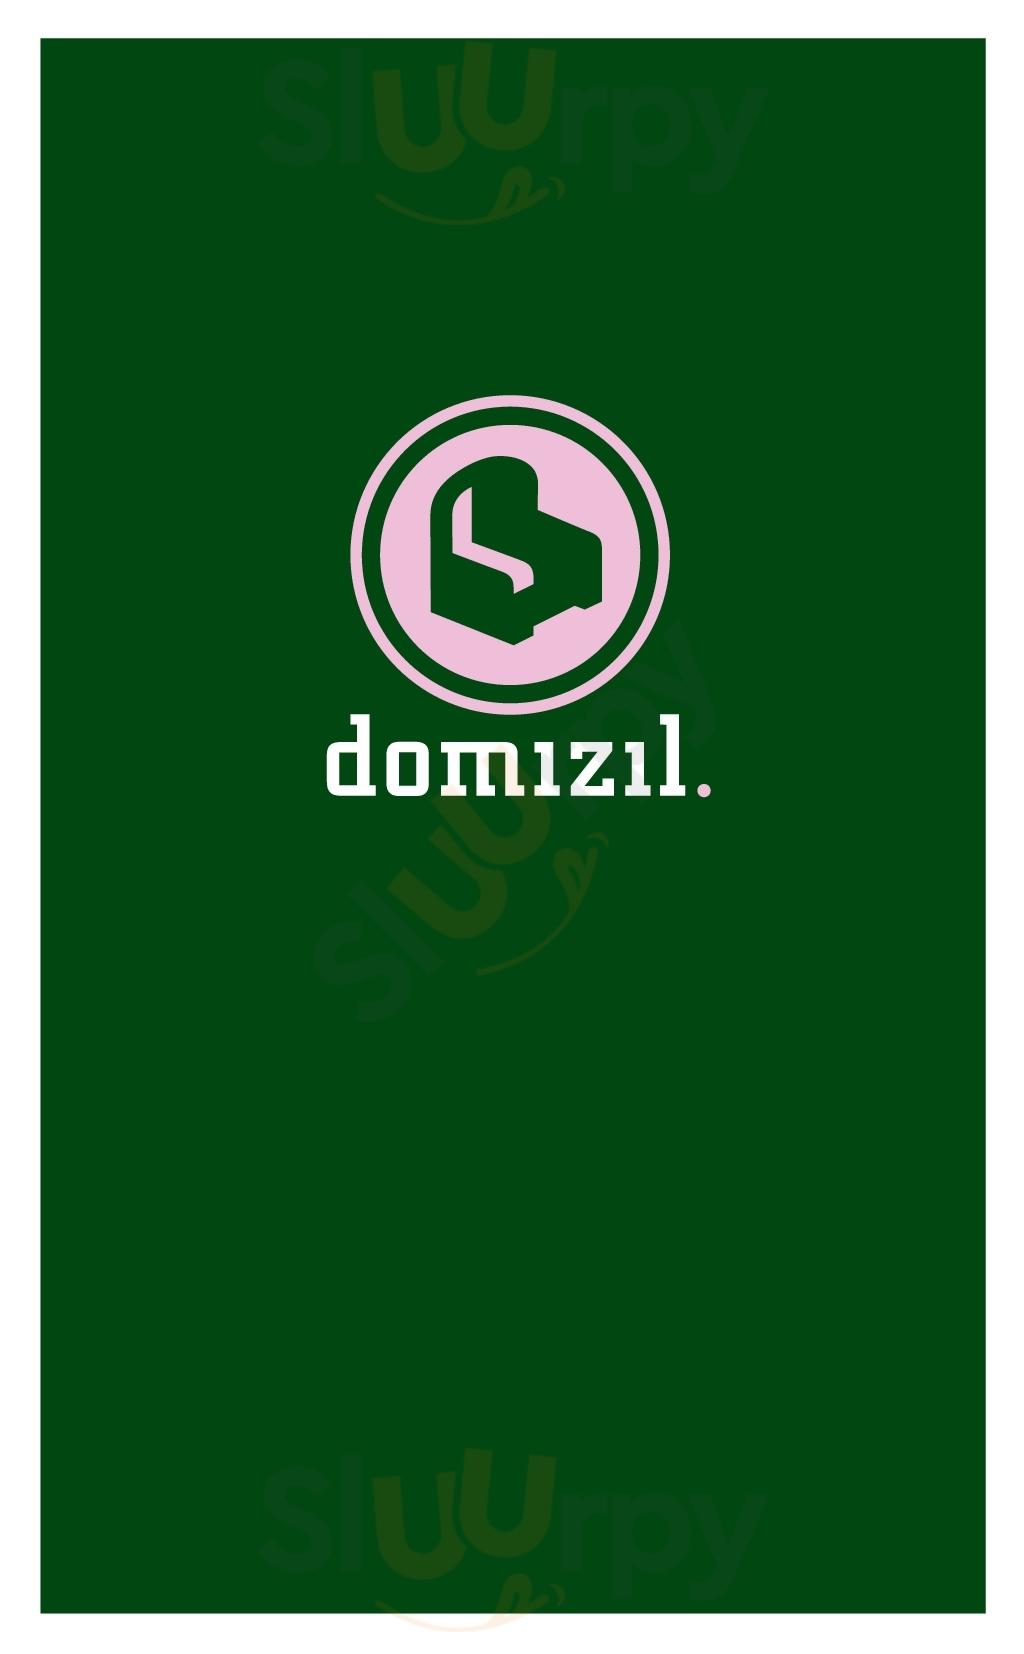 Domizil. Leonberg Menu - 1